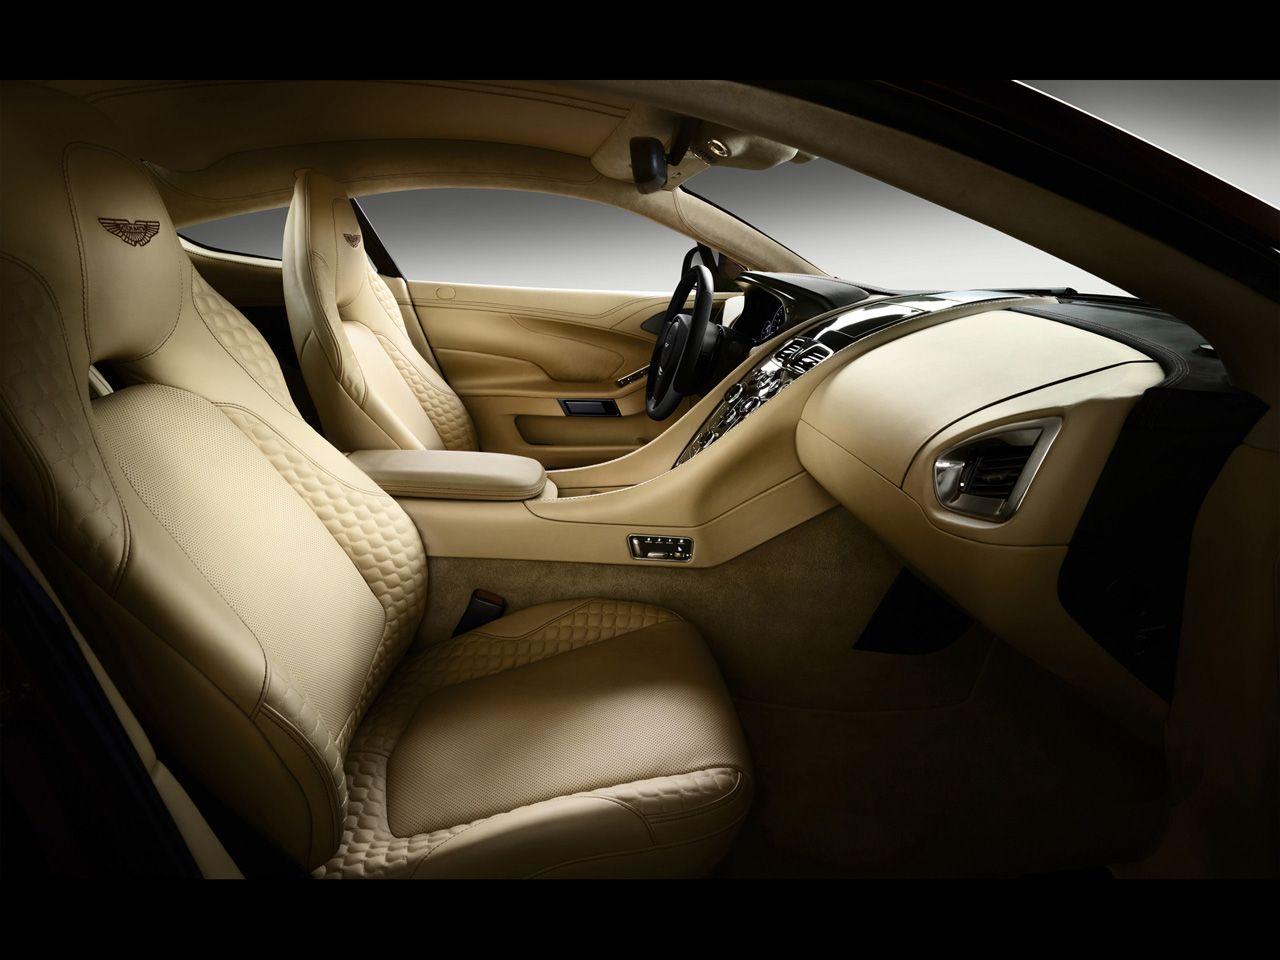 2013 Aston Martin Vanquish - Interior